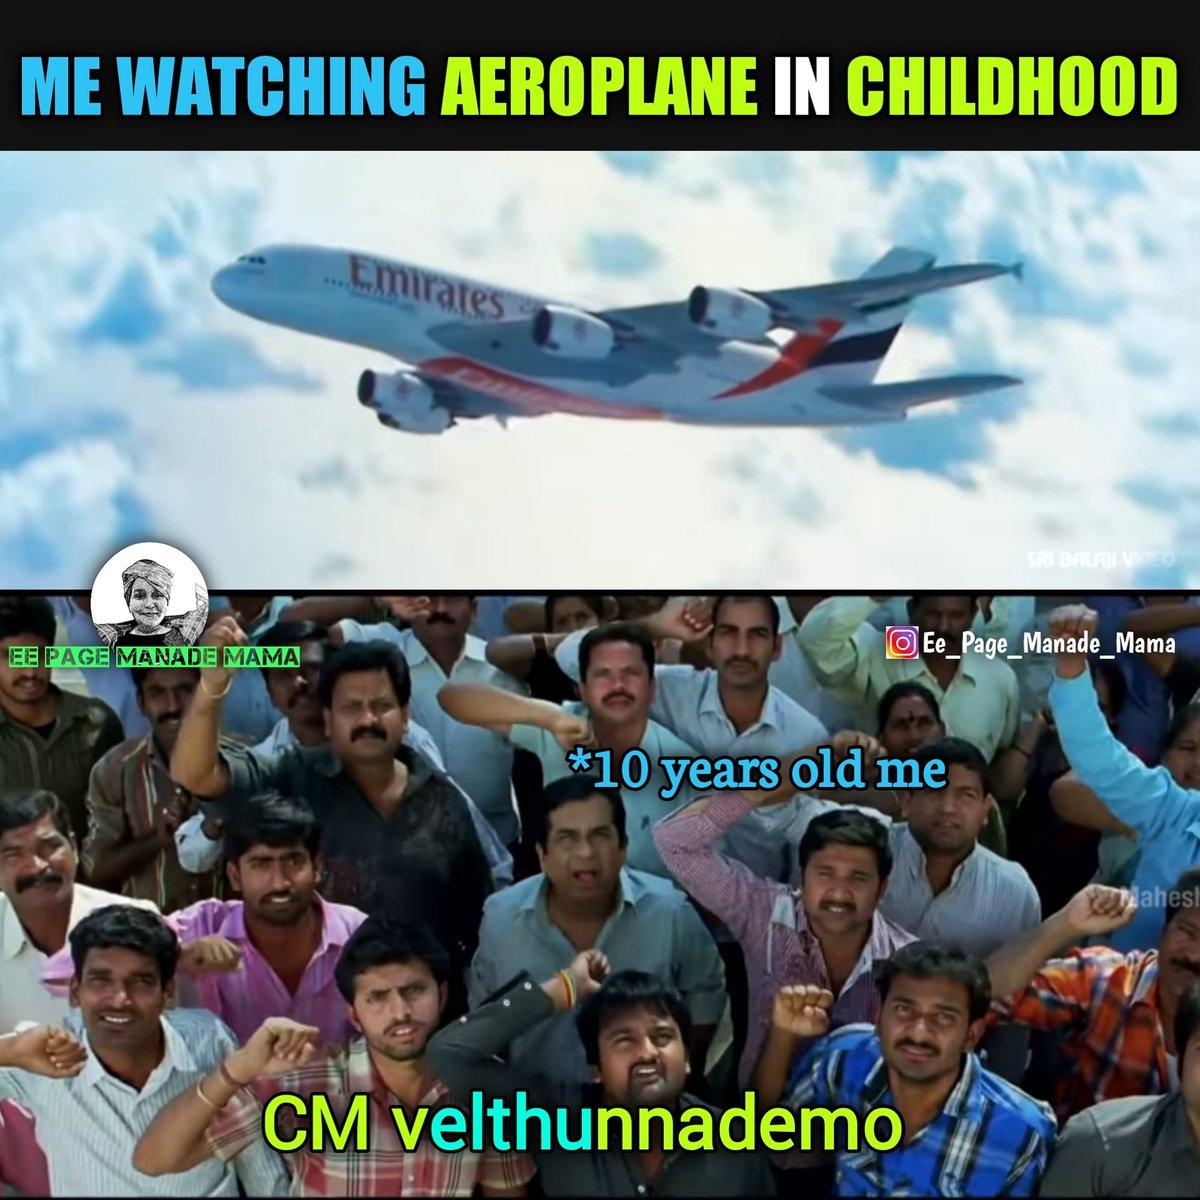 Chinnapudu Aeroplane velthunte adoka vinthala chusevadini . . #telugumems #tollywoodmemes #funnymemes #tollywood #telugujokes #memes#memesdaily #childhood #telugudaily #trendingnow #brahmijokes telugumovies #tollywoodjokespic.twitter.com/4EWxwgaOpC